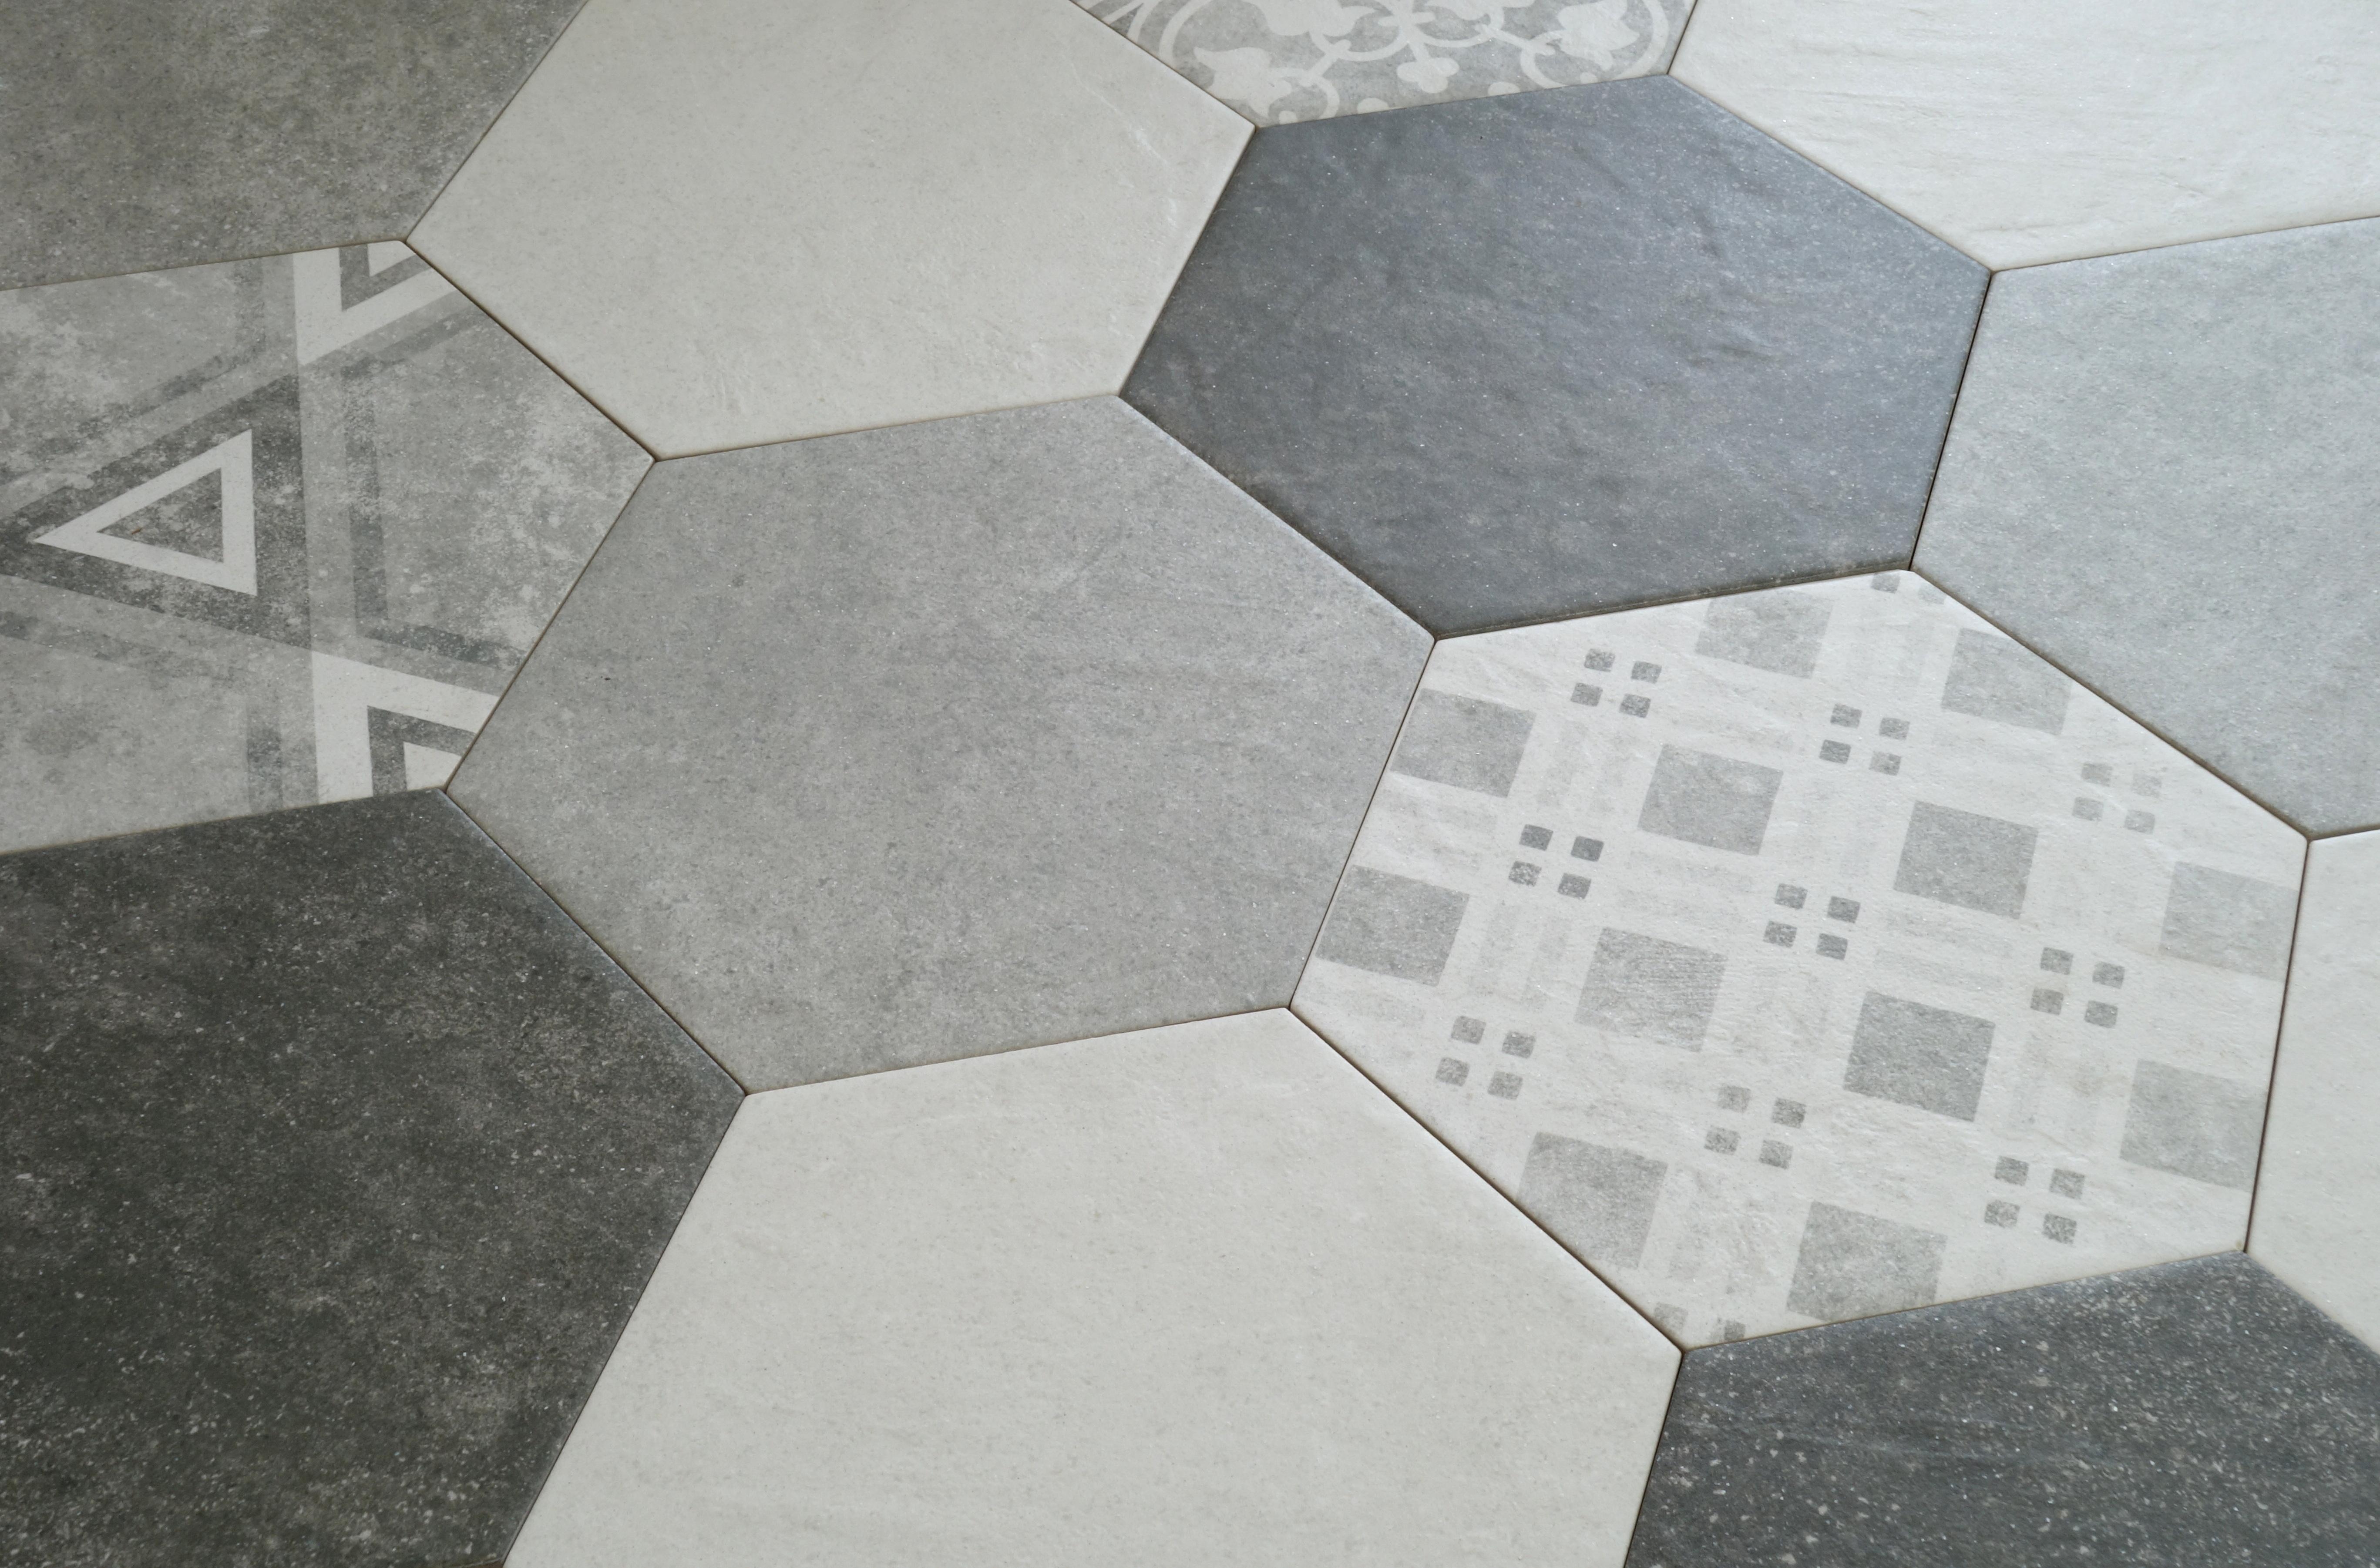 Pytki Cement Boydar Modern Cement Floor Tiles With Pytki Cement - Affordable encaustic tiles